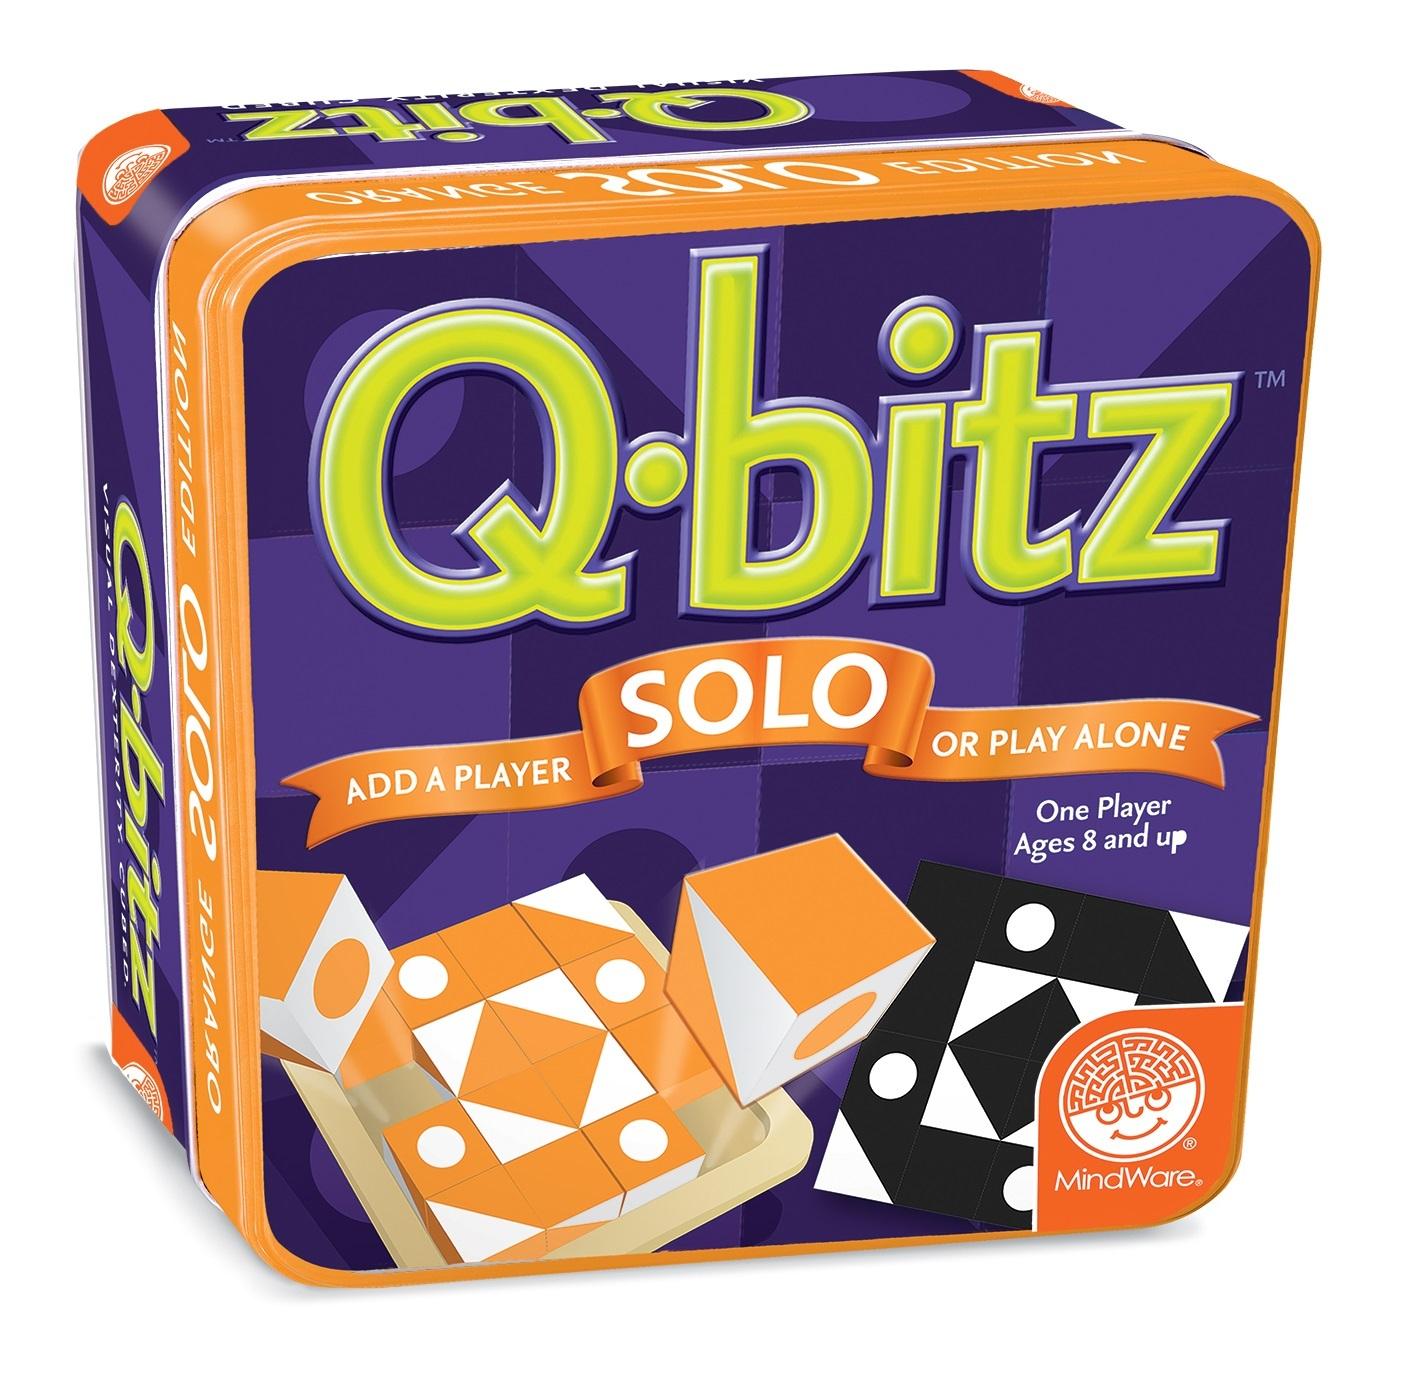 Mindware Games: Q-bitz Solo - Orange Edition image